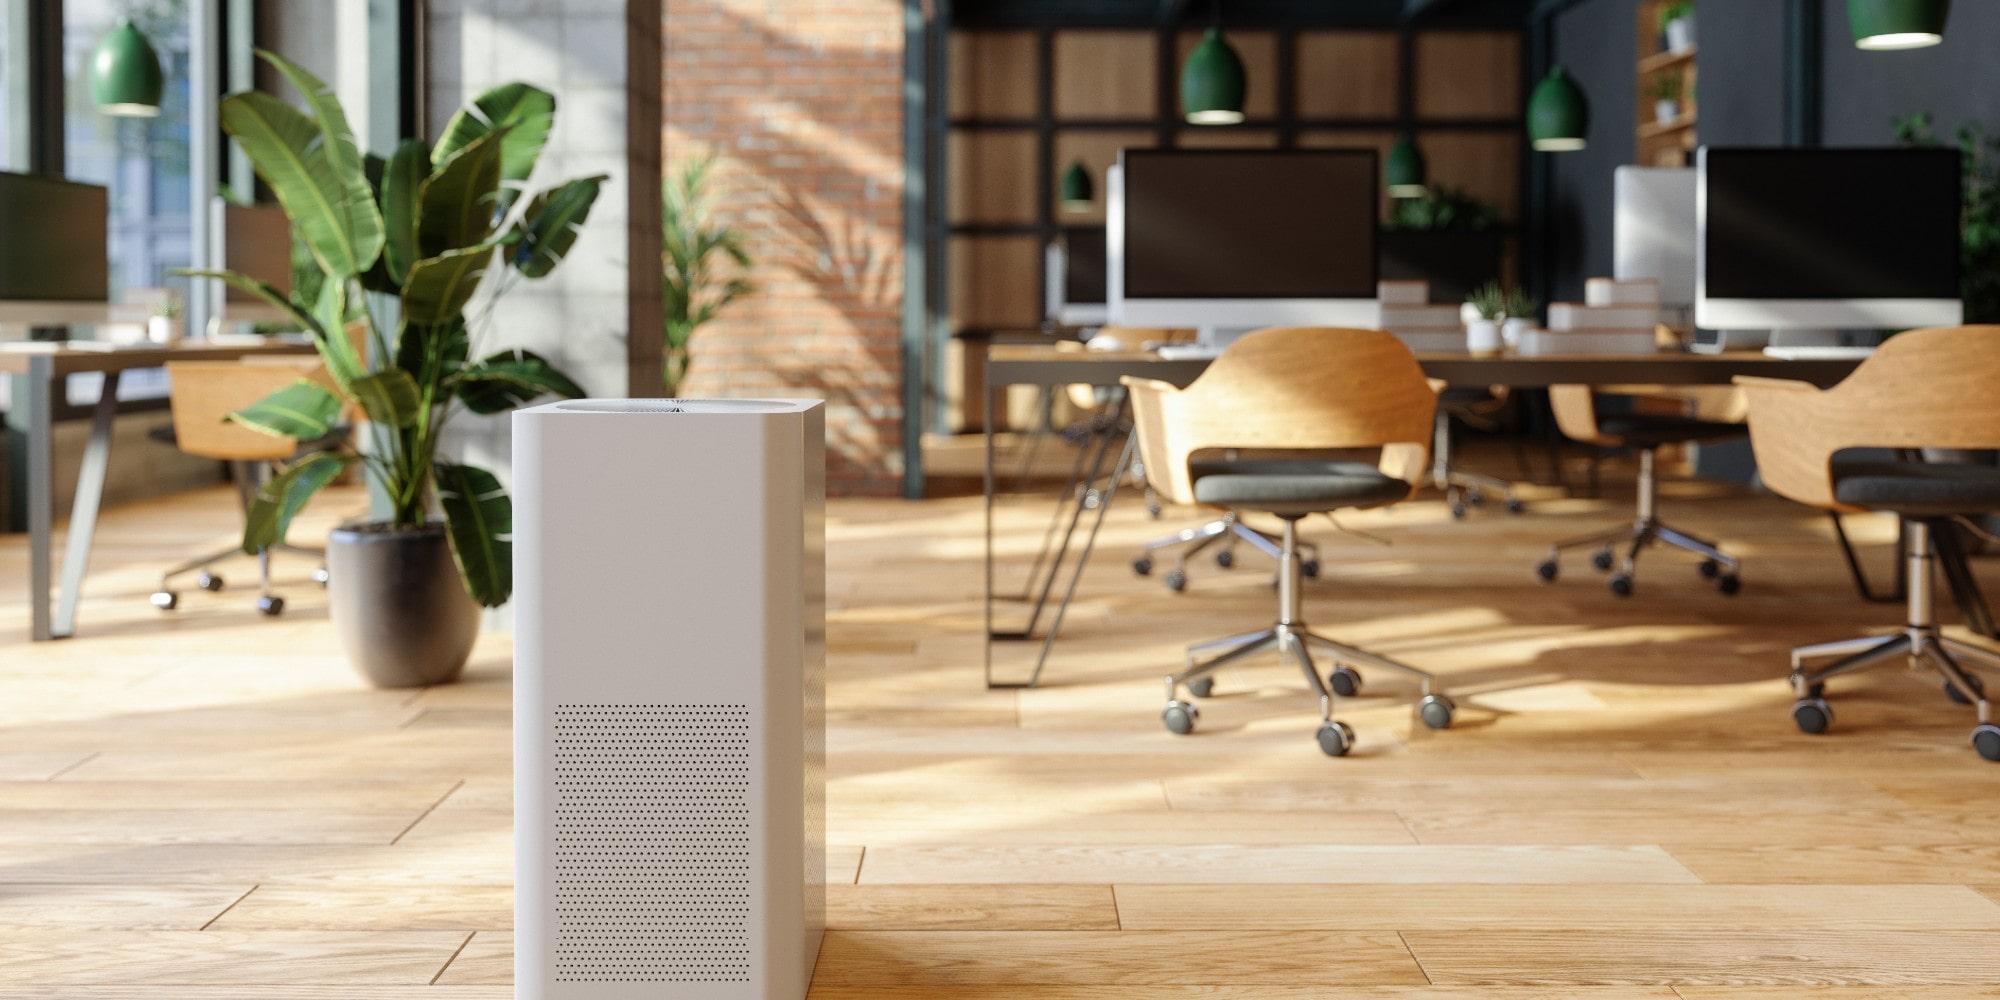 Air Quality control air scrubber in an office